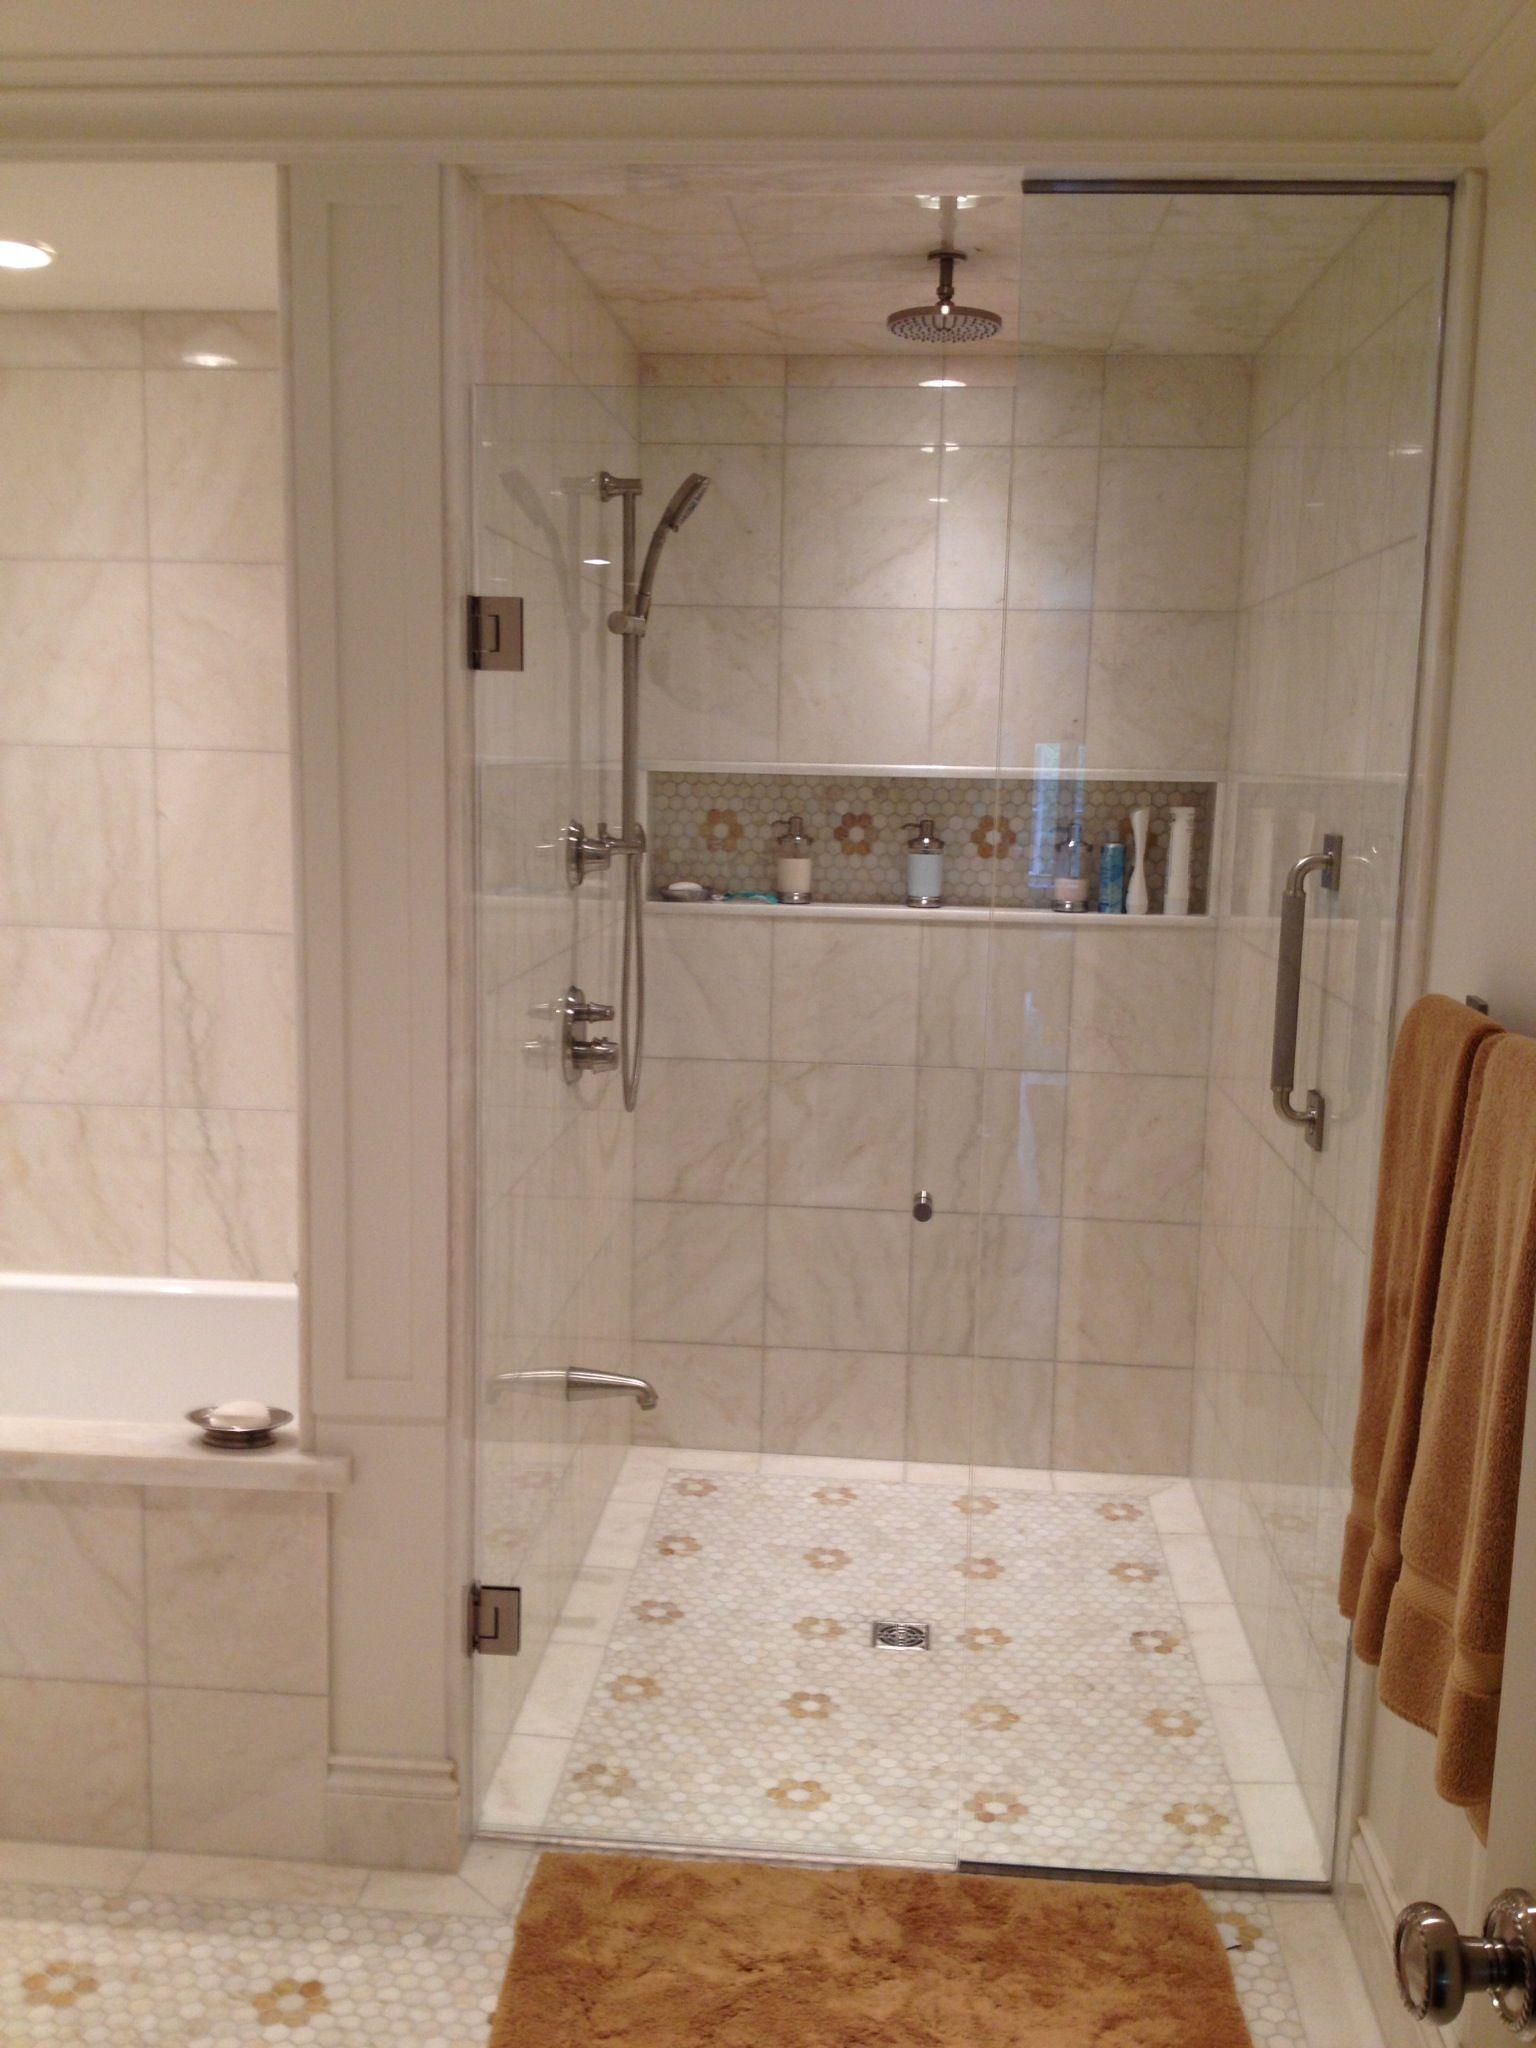 Shower ledge Shower niche